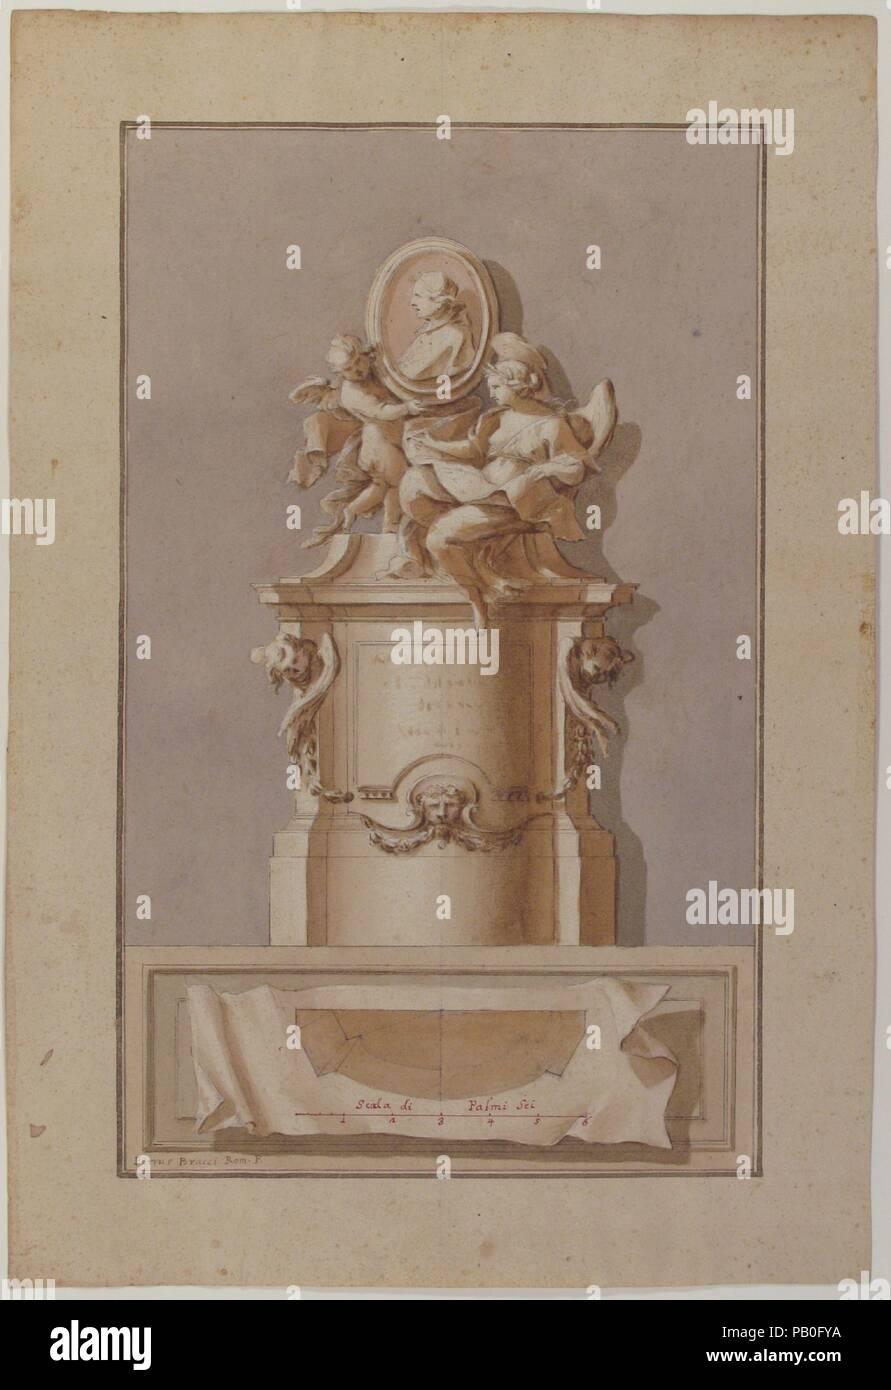 Design for a Tomb. Artist: Pietro Bracci (Italian, Rome 1700-1773 Rome). Dimensions: 15 5/8 x 10 9/16in. (39.7 x 26.8cm). Date: 1700-1773. Museum: Metropolitan Museum of Art, New York, USA. Stock Photo